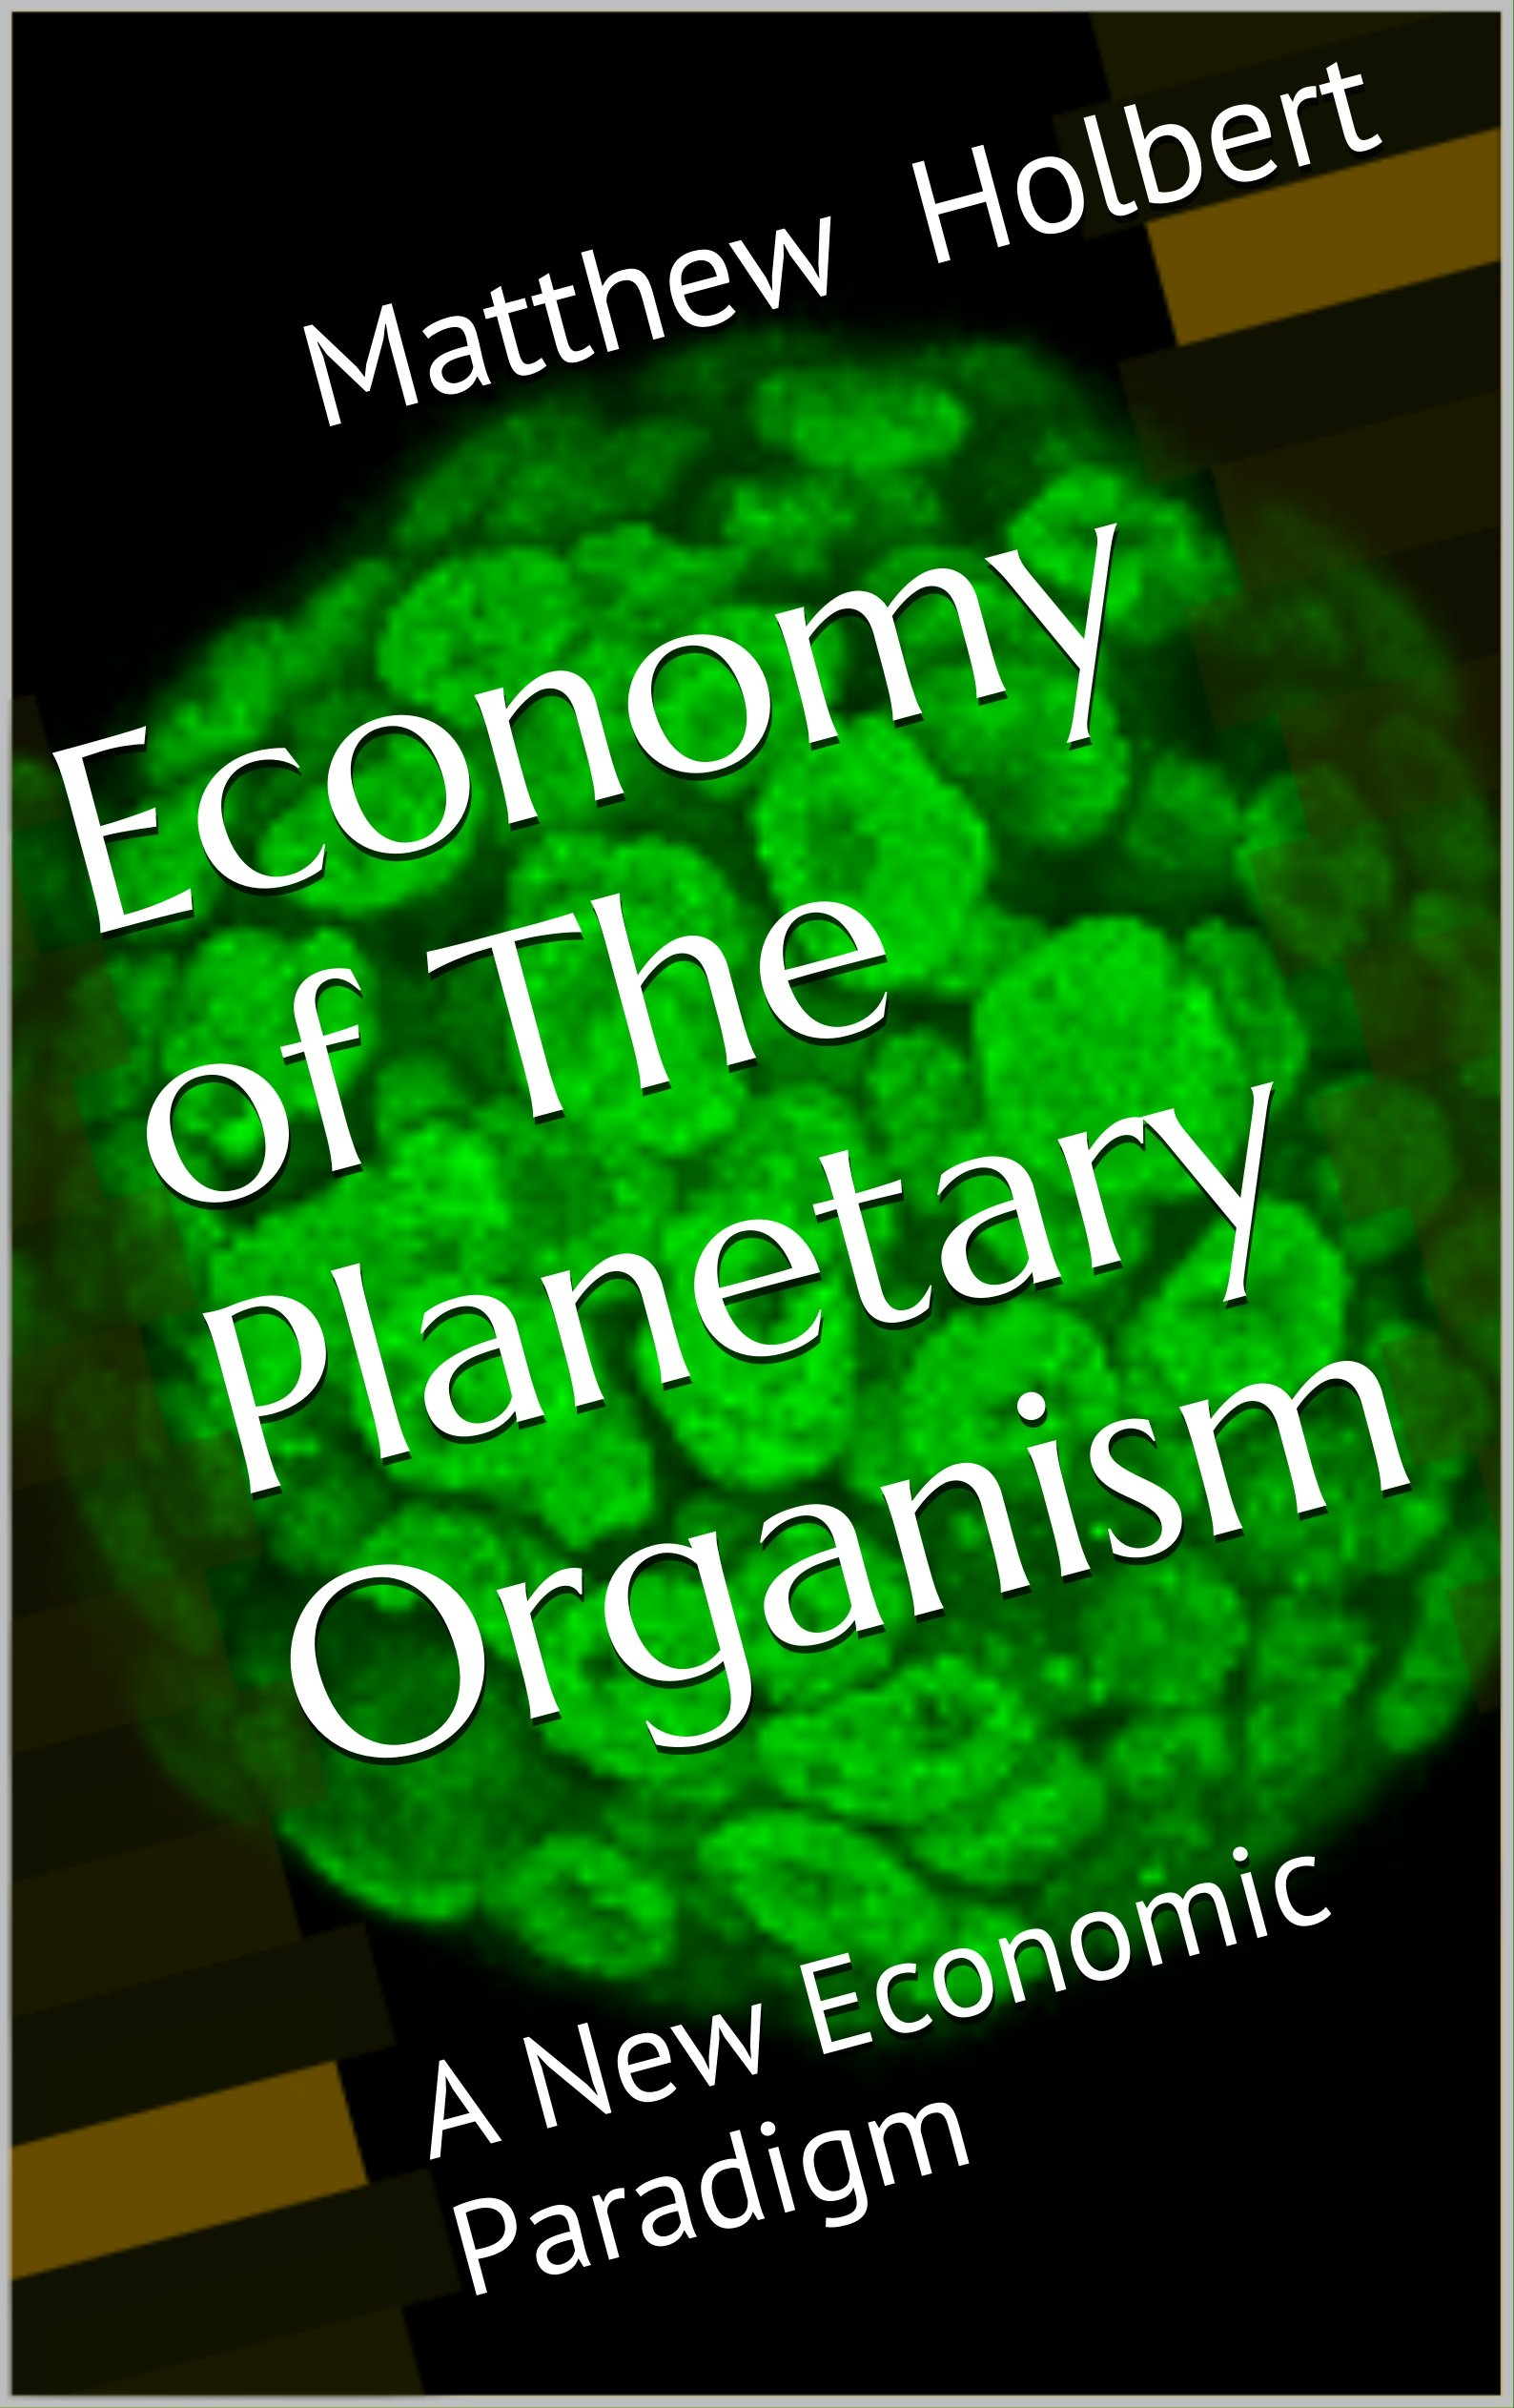 Economy of The Planetary Organism: A New Economic Paradigm